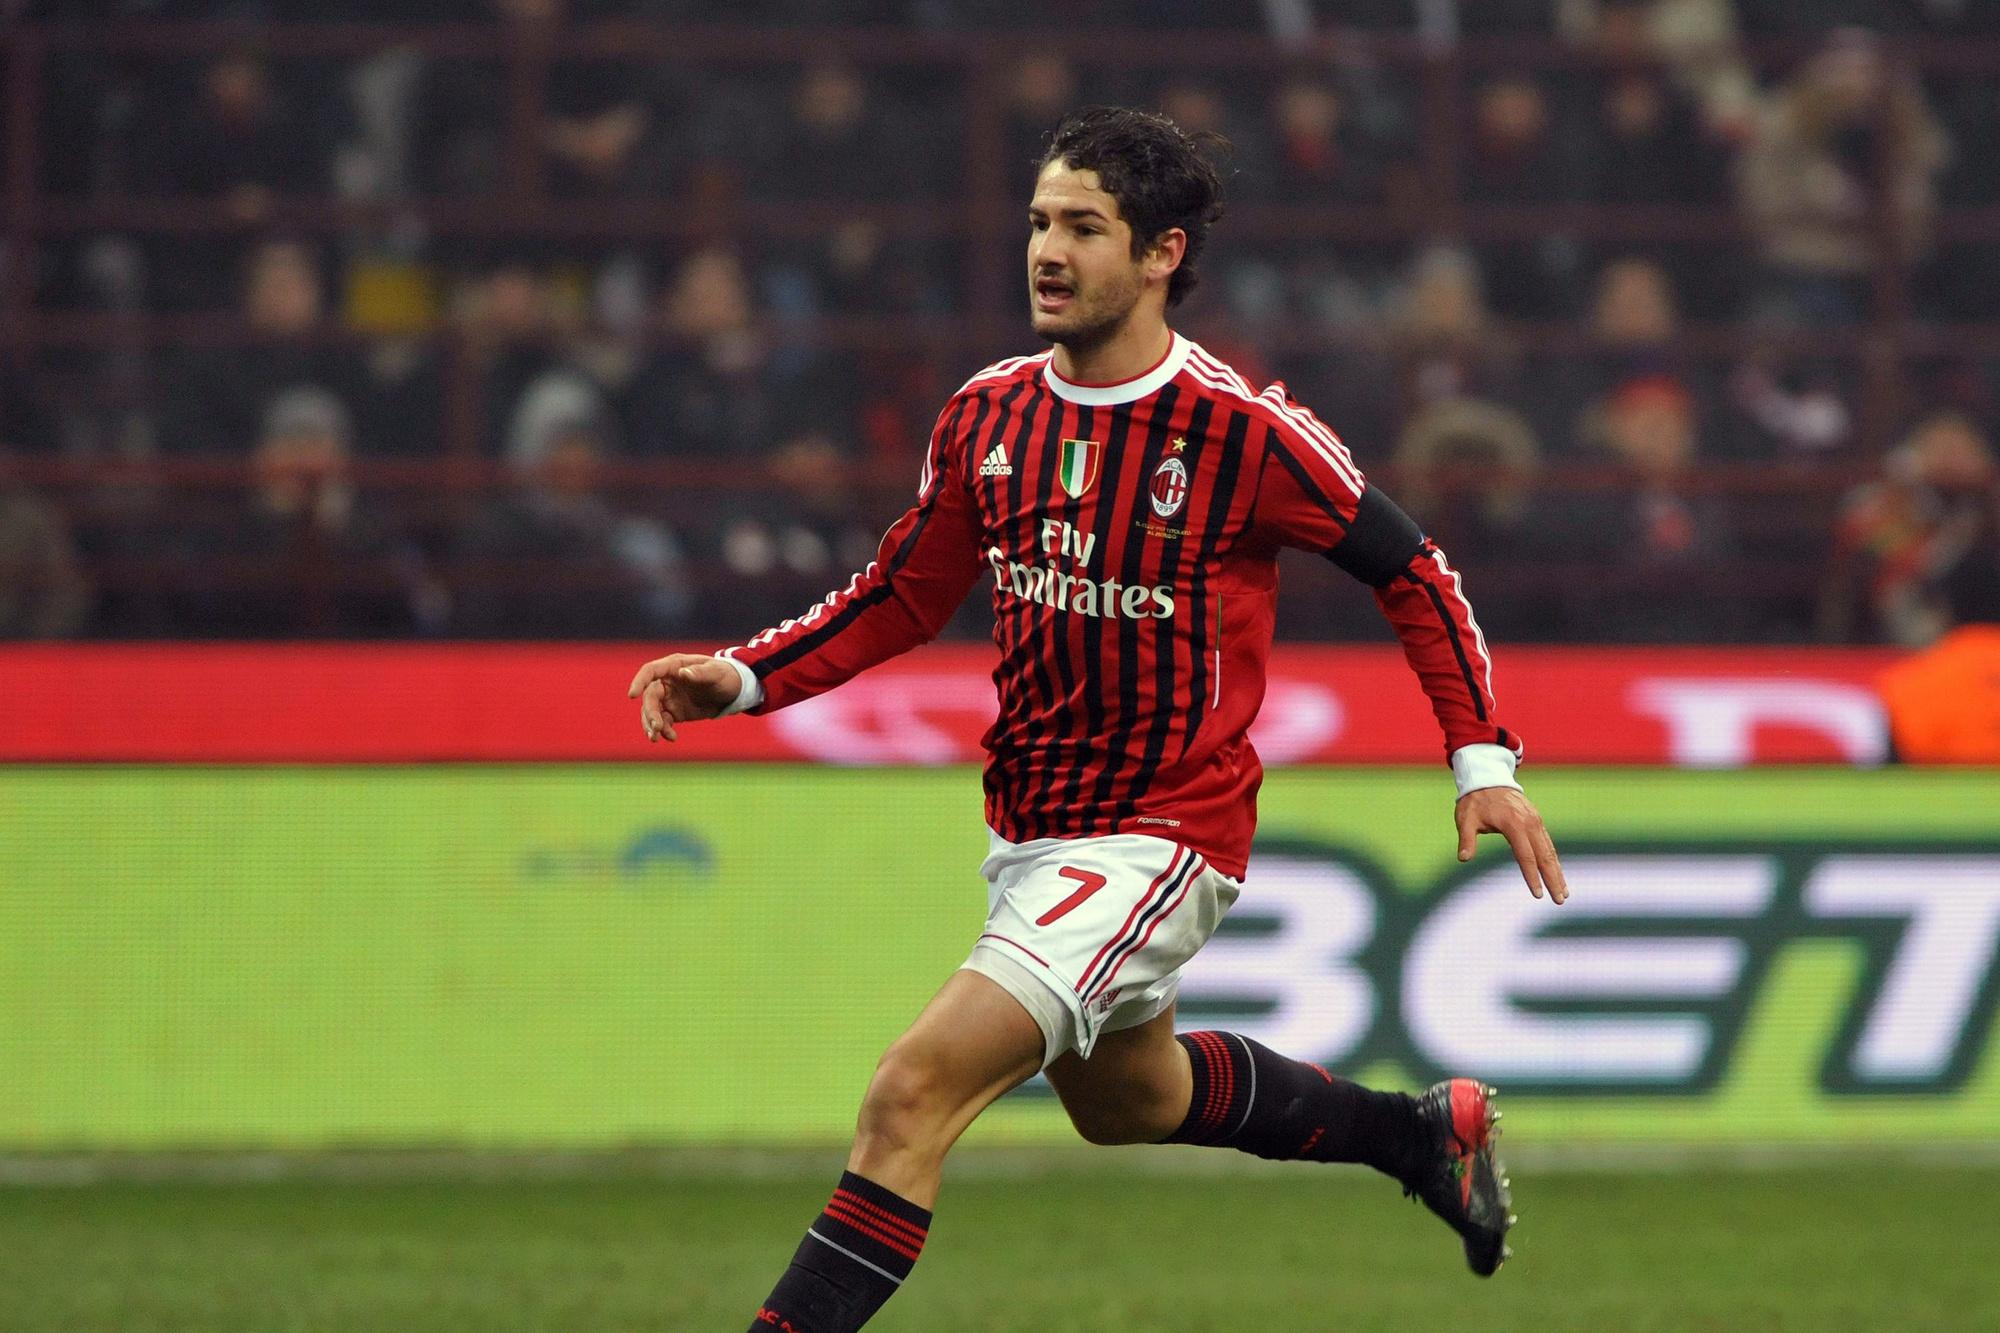 Alexandre Pato du temps de sa splendeur rossonera., ICONSPORT